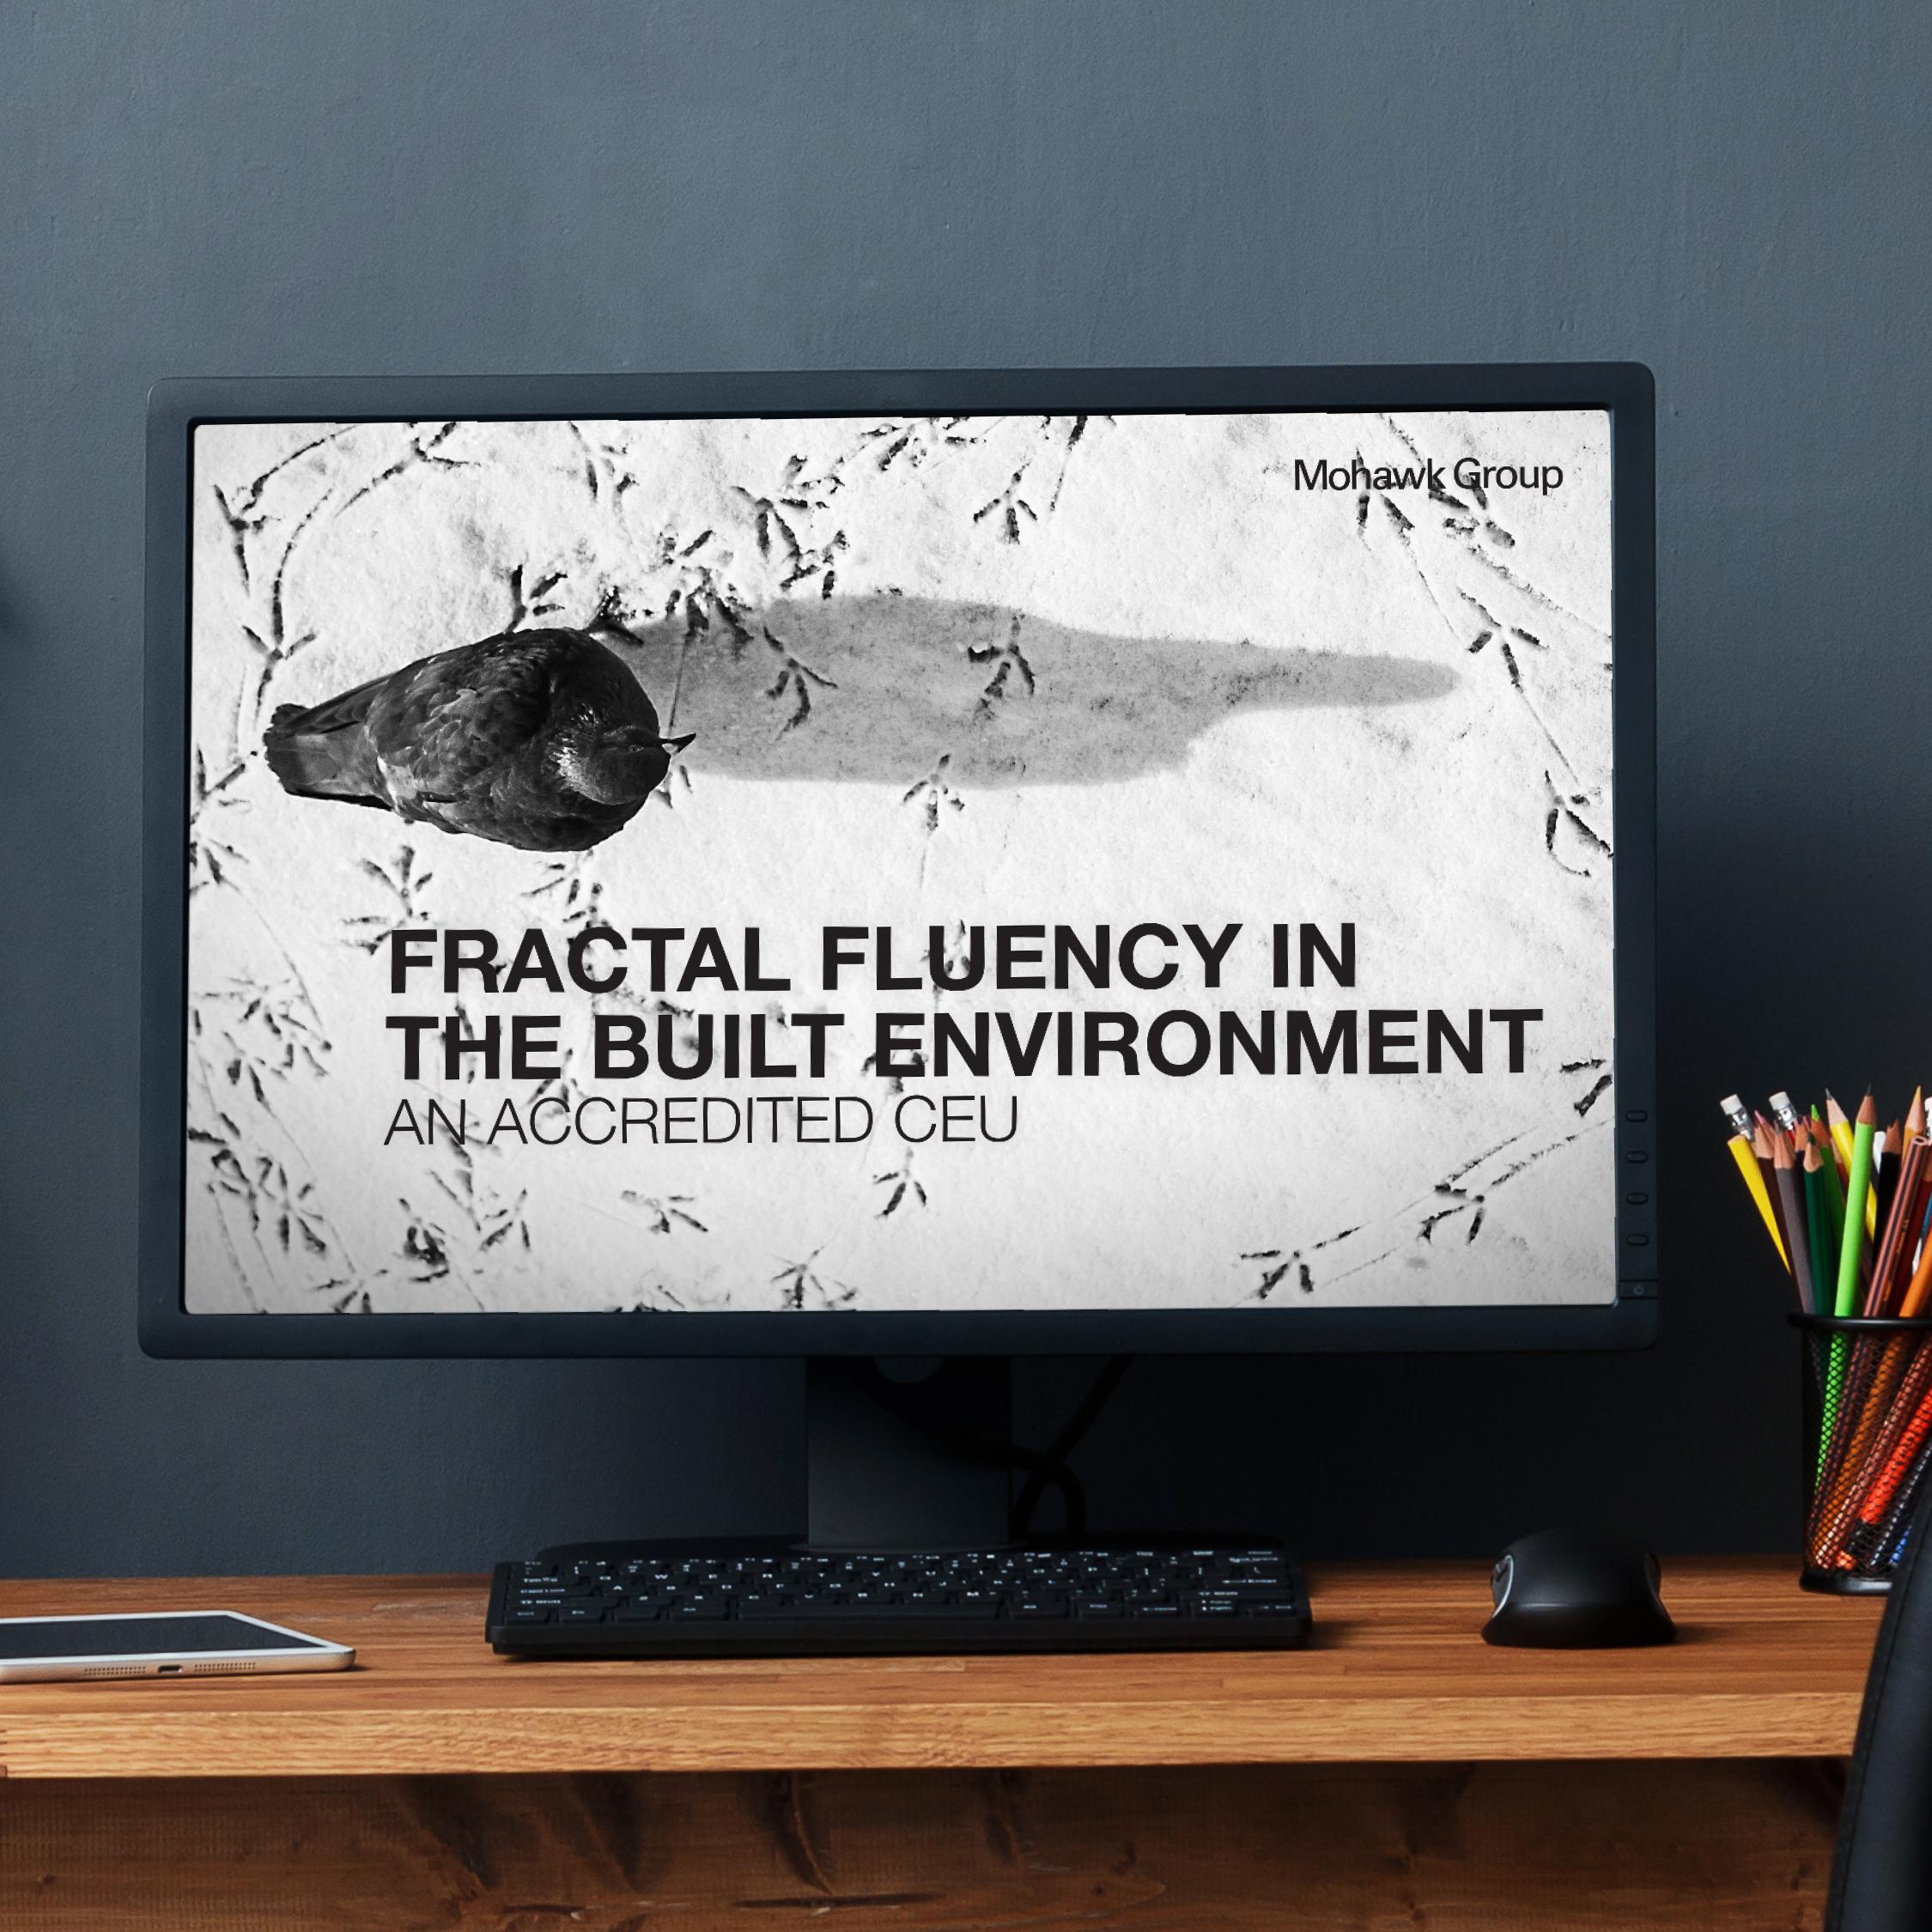 Fractal Fluency in the Built Environment